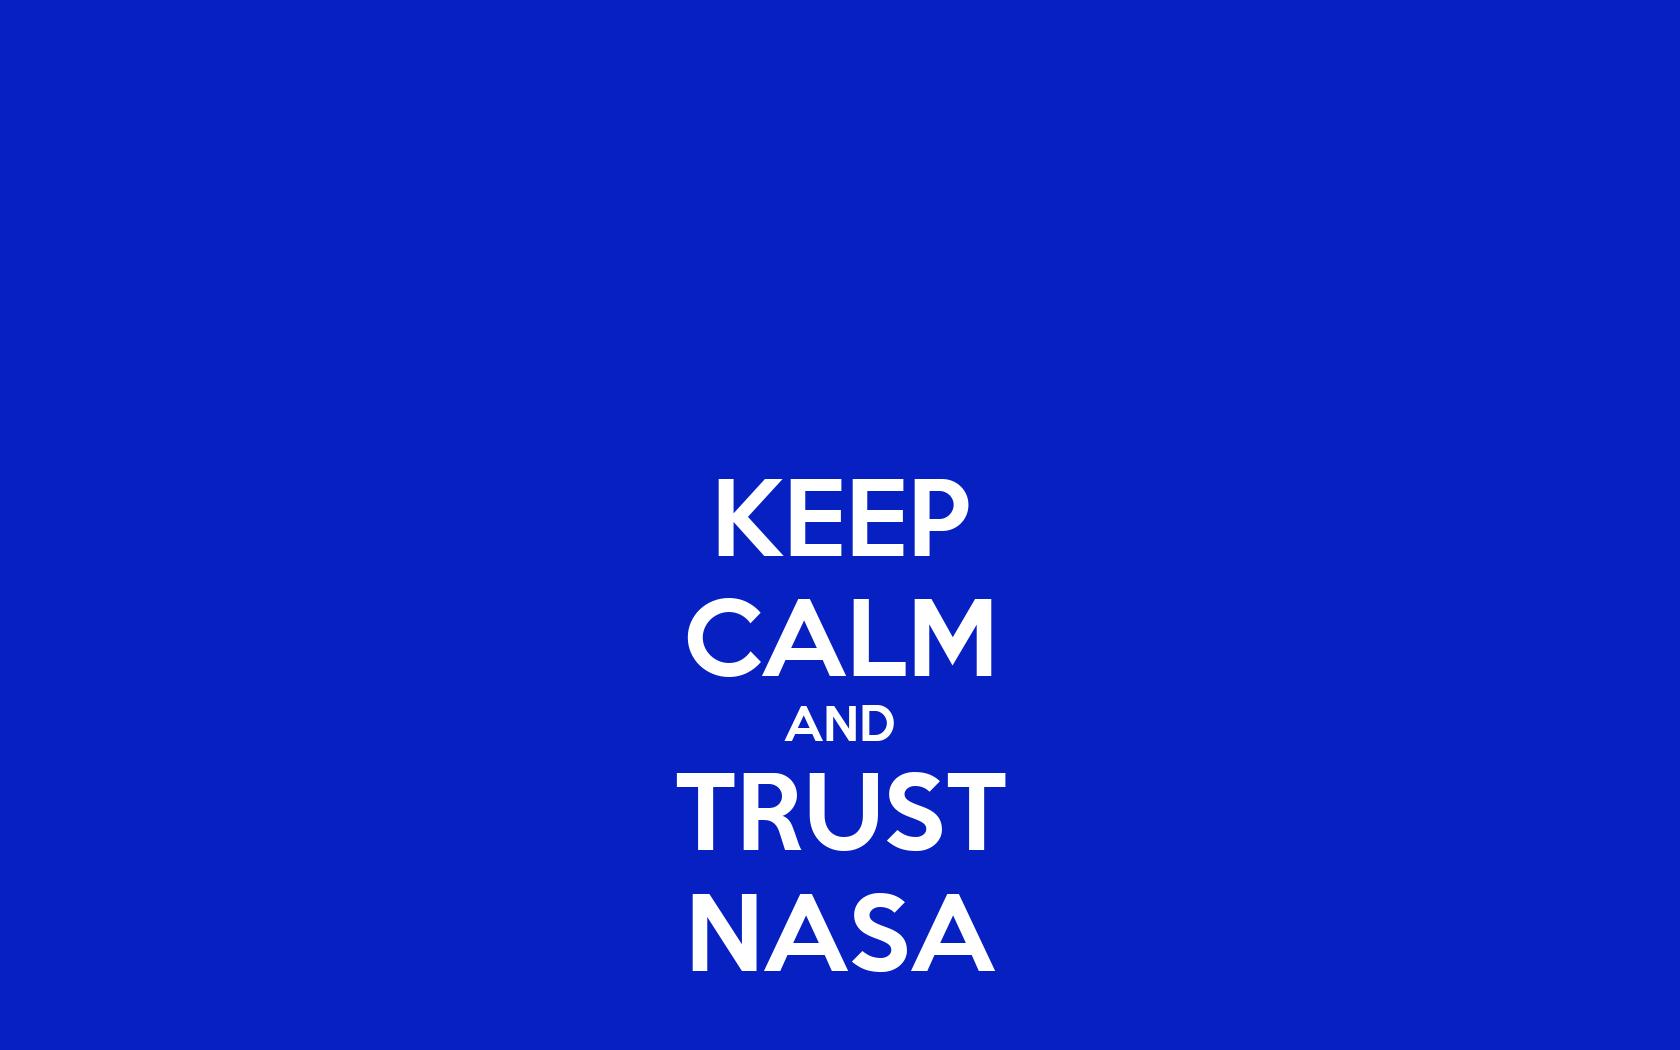 KEEP CALM AND TRUST NASA Poster | tOM | Keep Calm-o-Matic